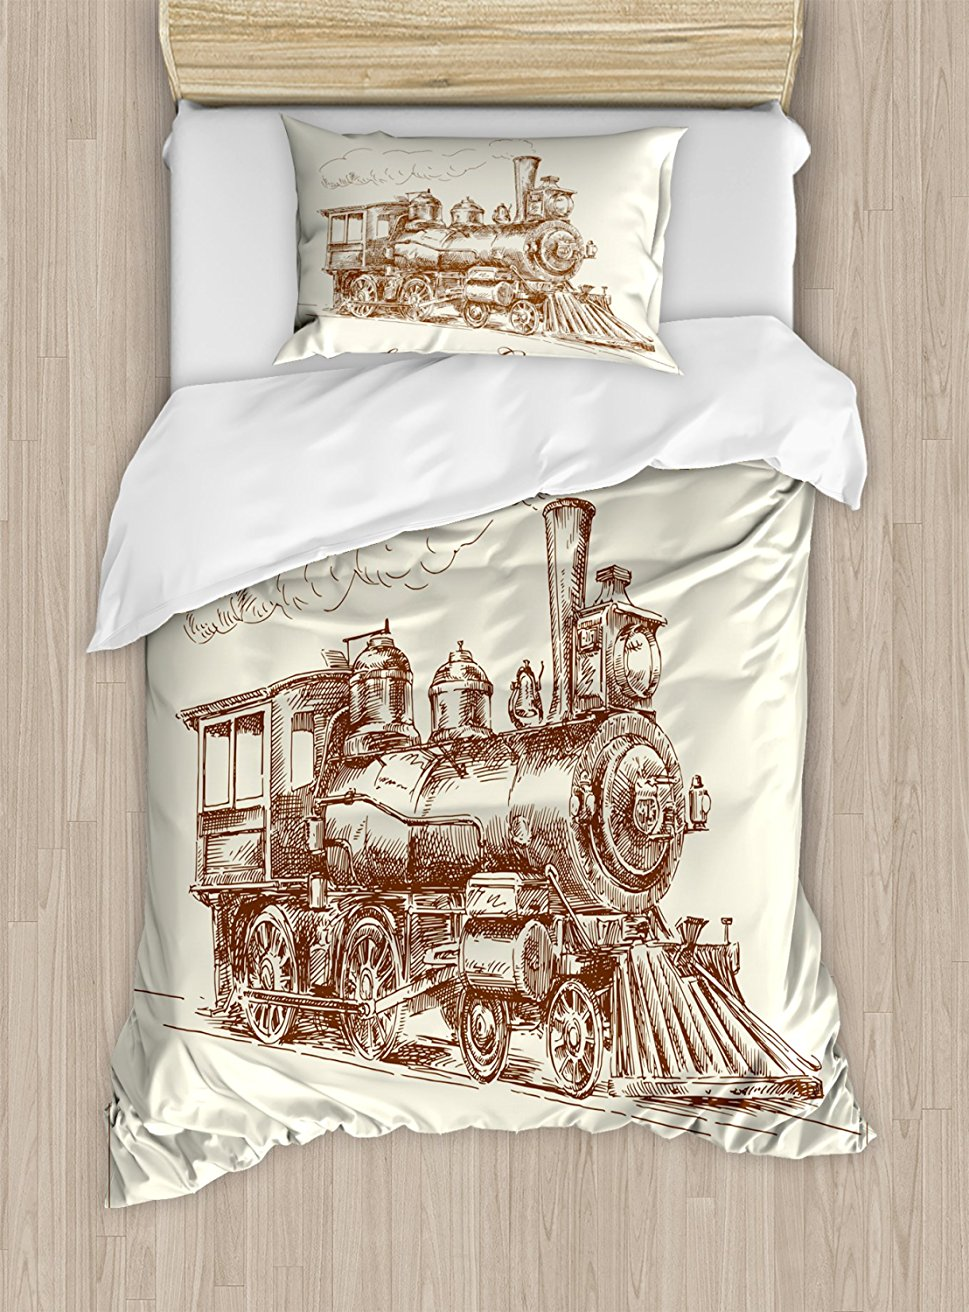 Steam Engine Duvet Cover Set , Old Times Train Vintage Hand Drawn Iron Industrial Era Locomotive, 4 Piece Bedding Set